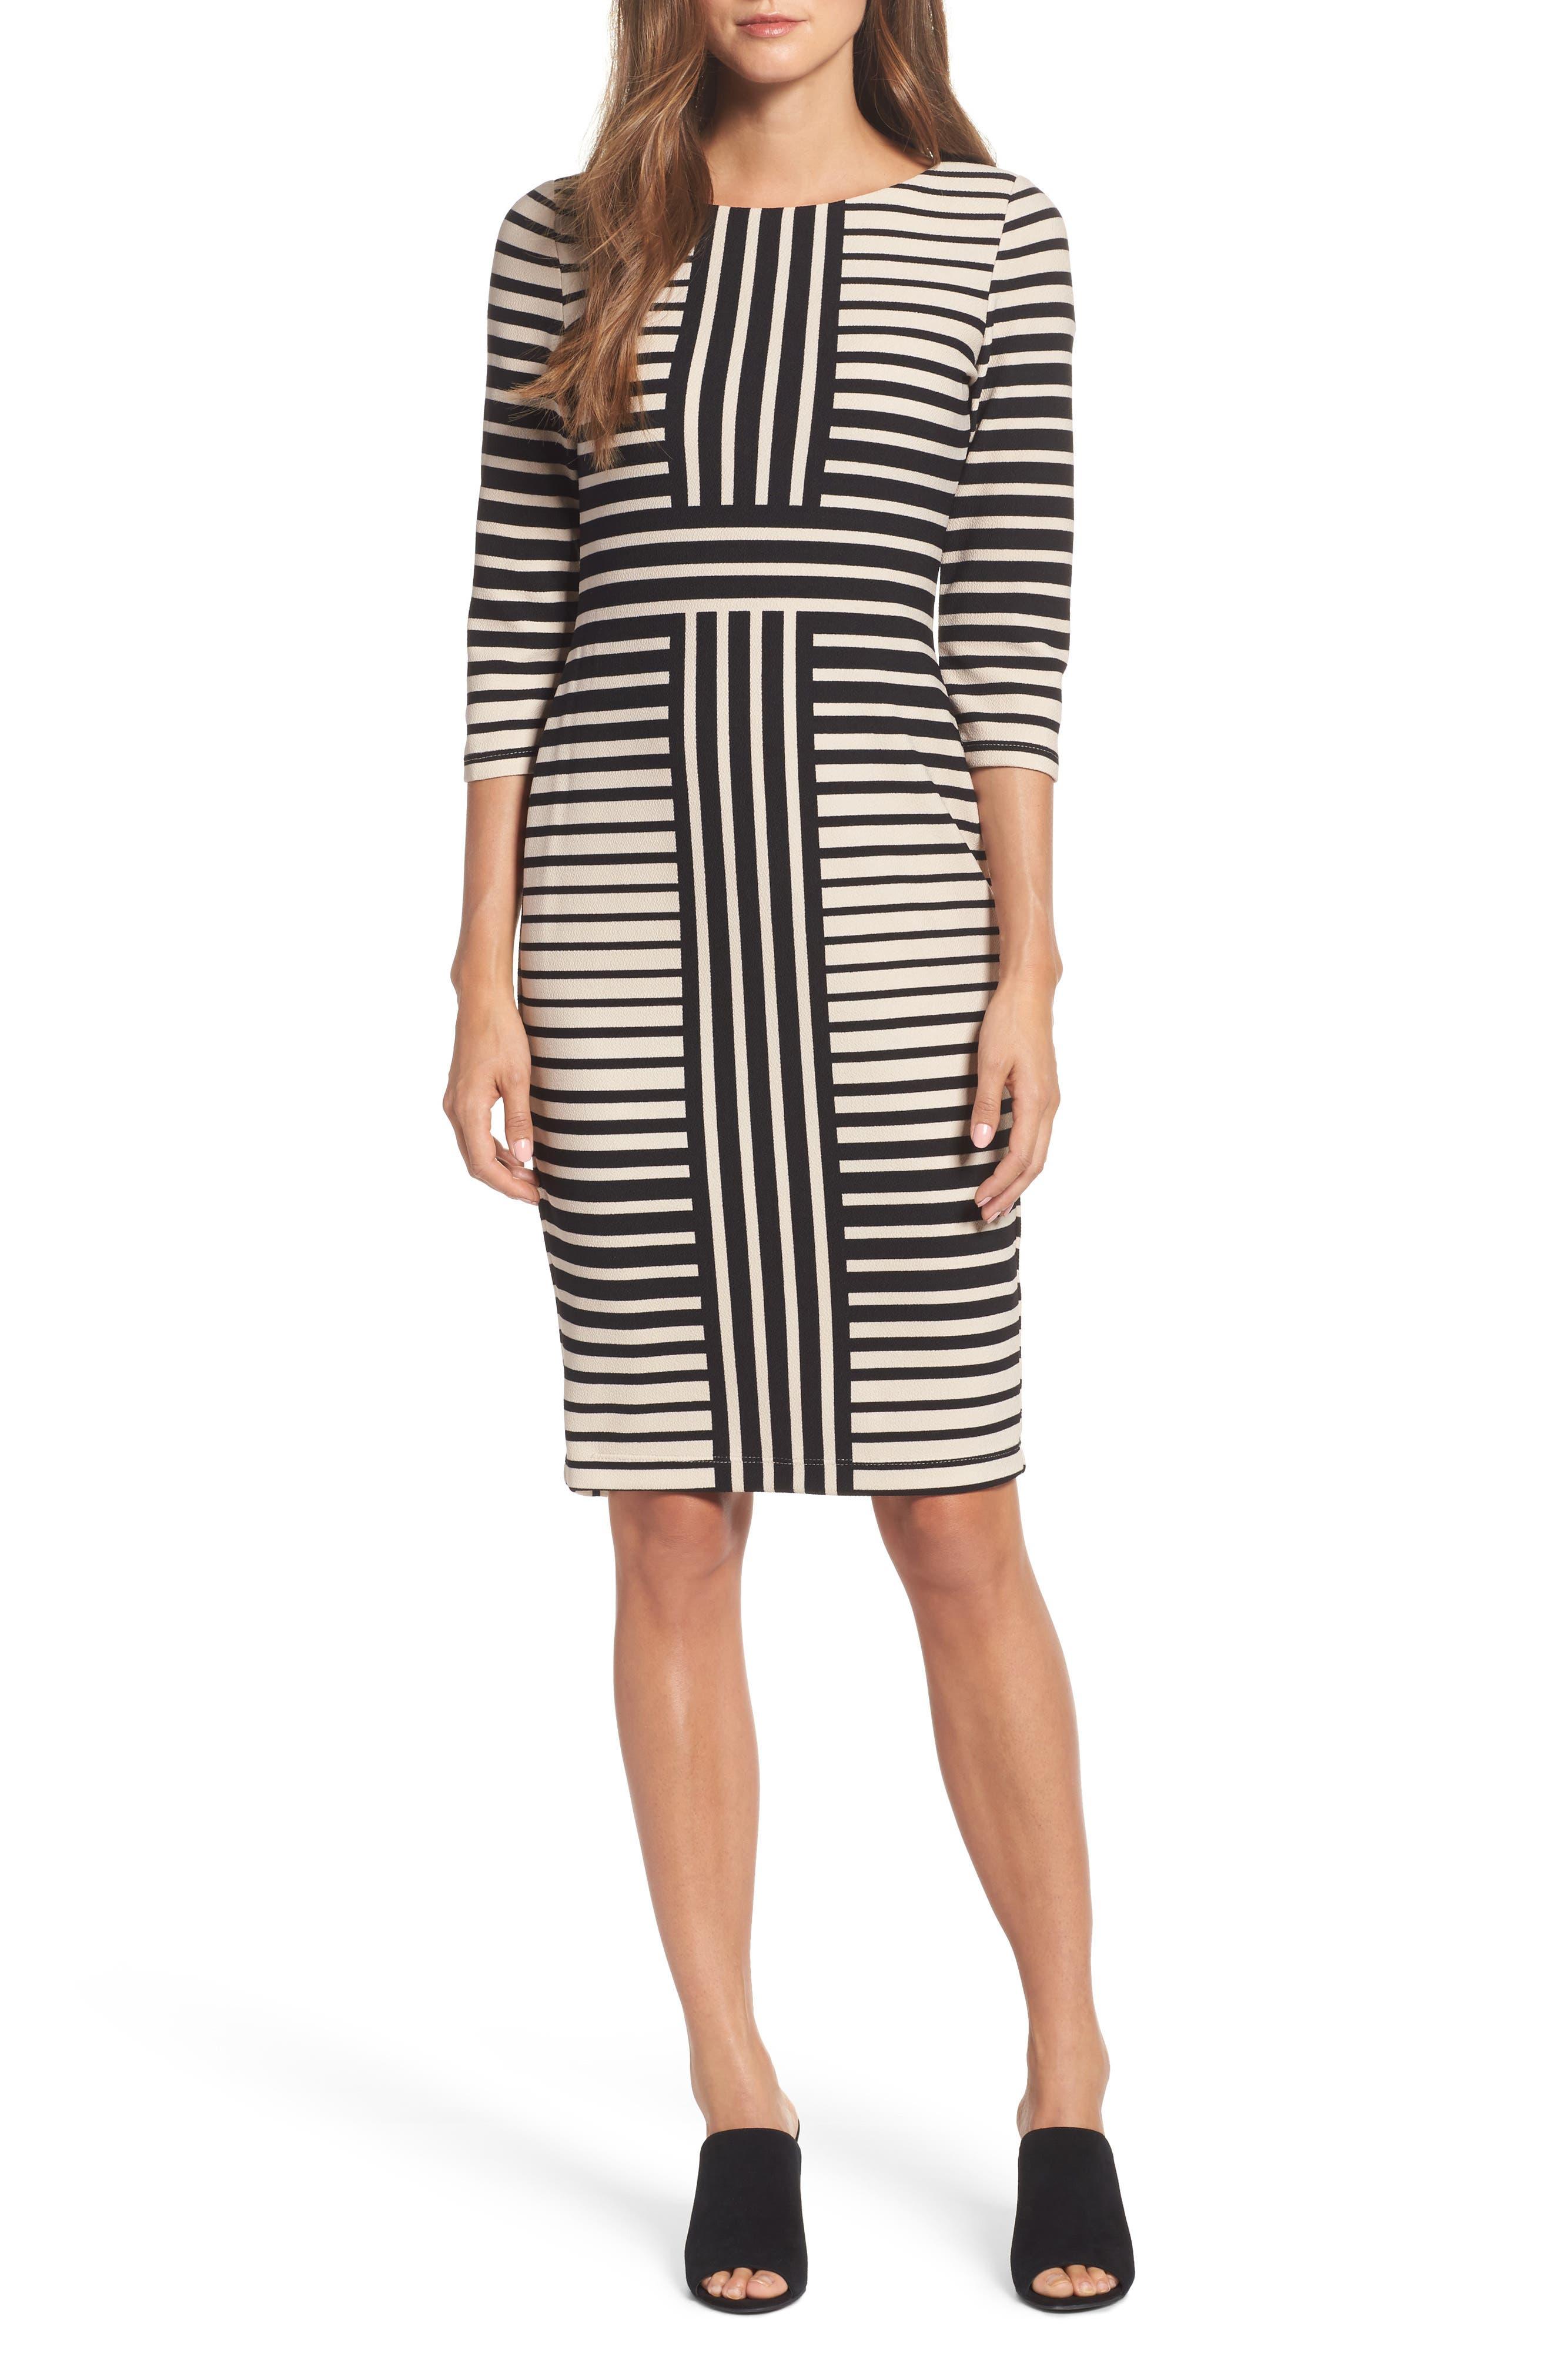 Alternate Image 1 Selected - Gabby Skye Stripe Sheath Dress